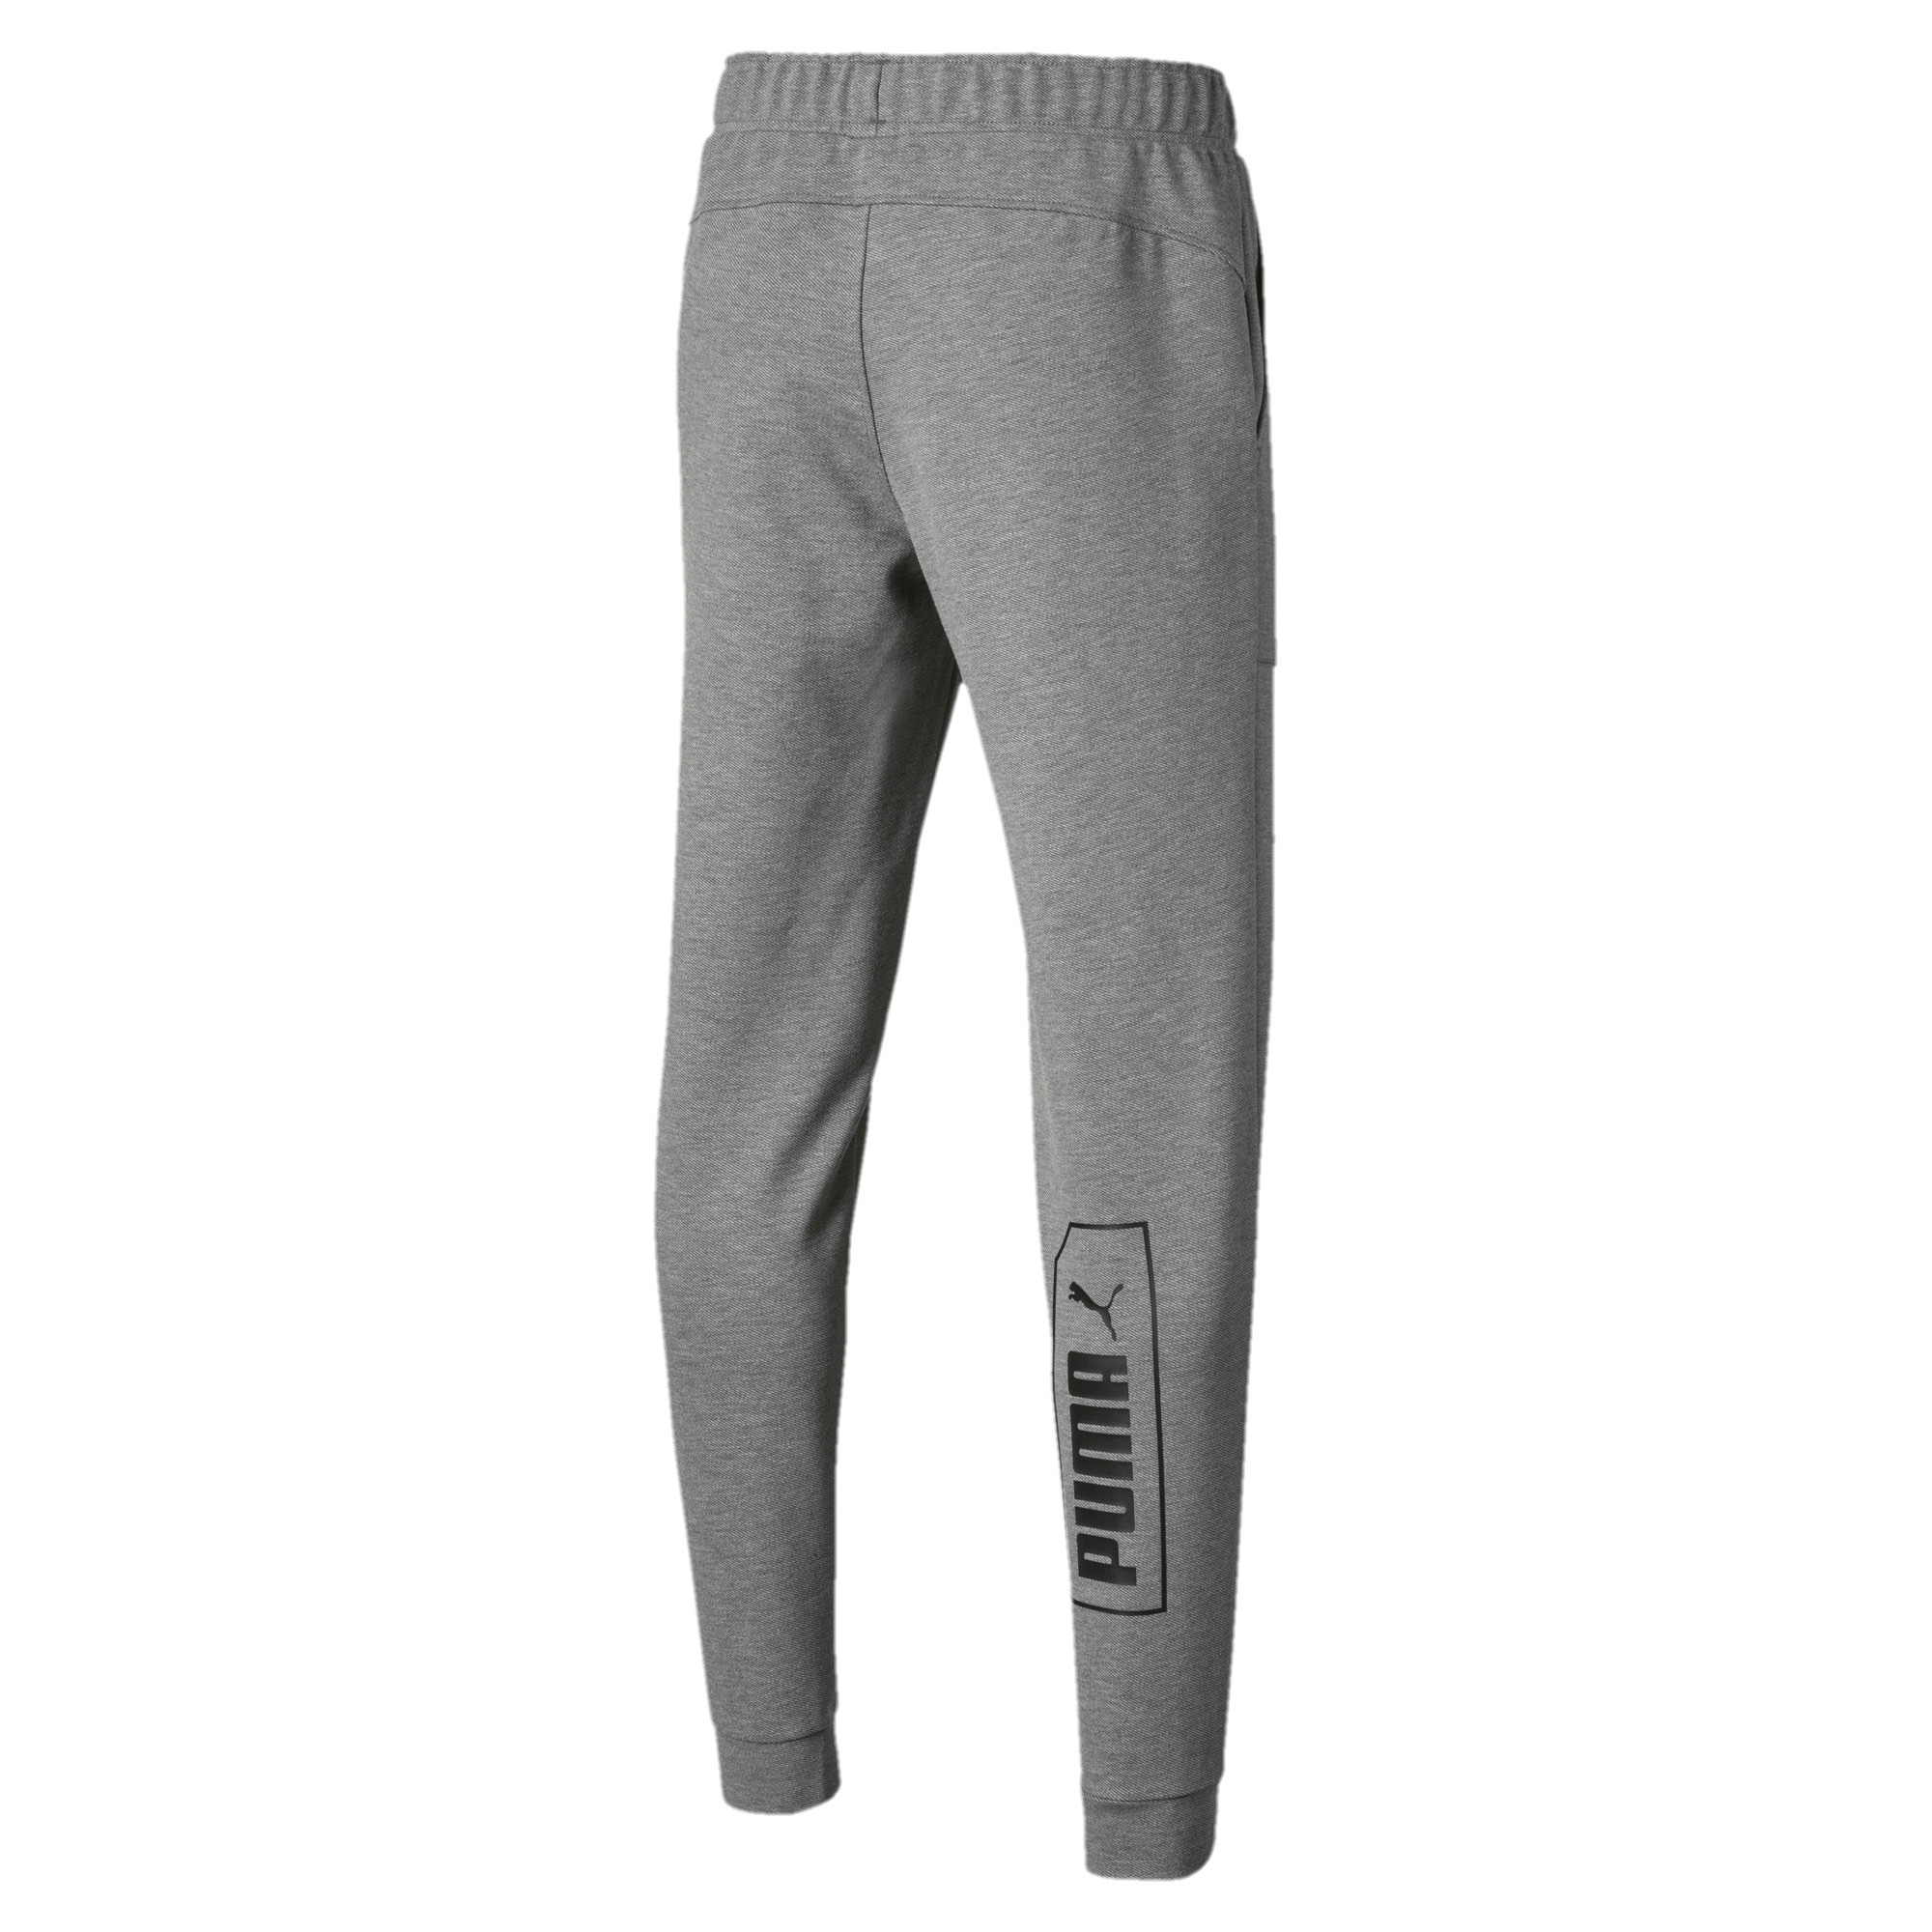 PUMA-NU-TILITY-Men-039-s-Sweatpants-Men-Knitted-Pants-Basics thumbnail 3